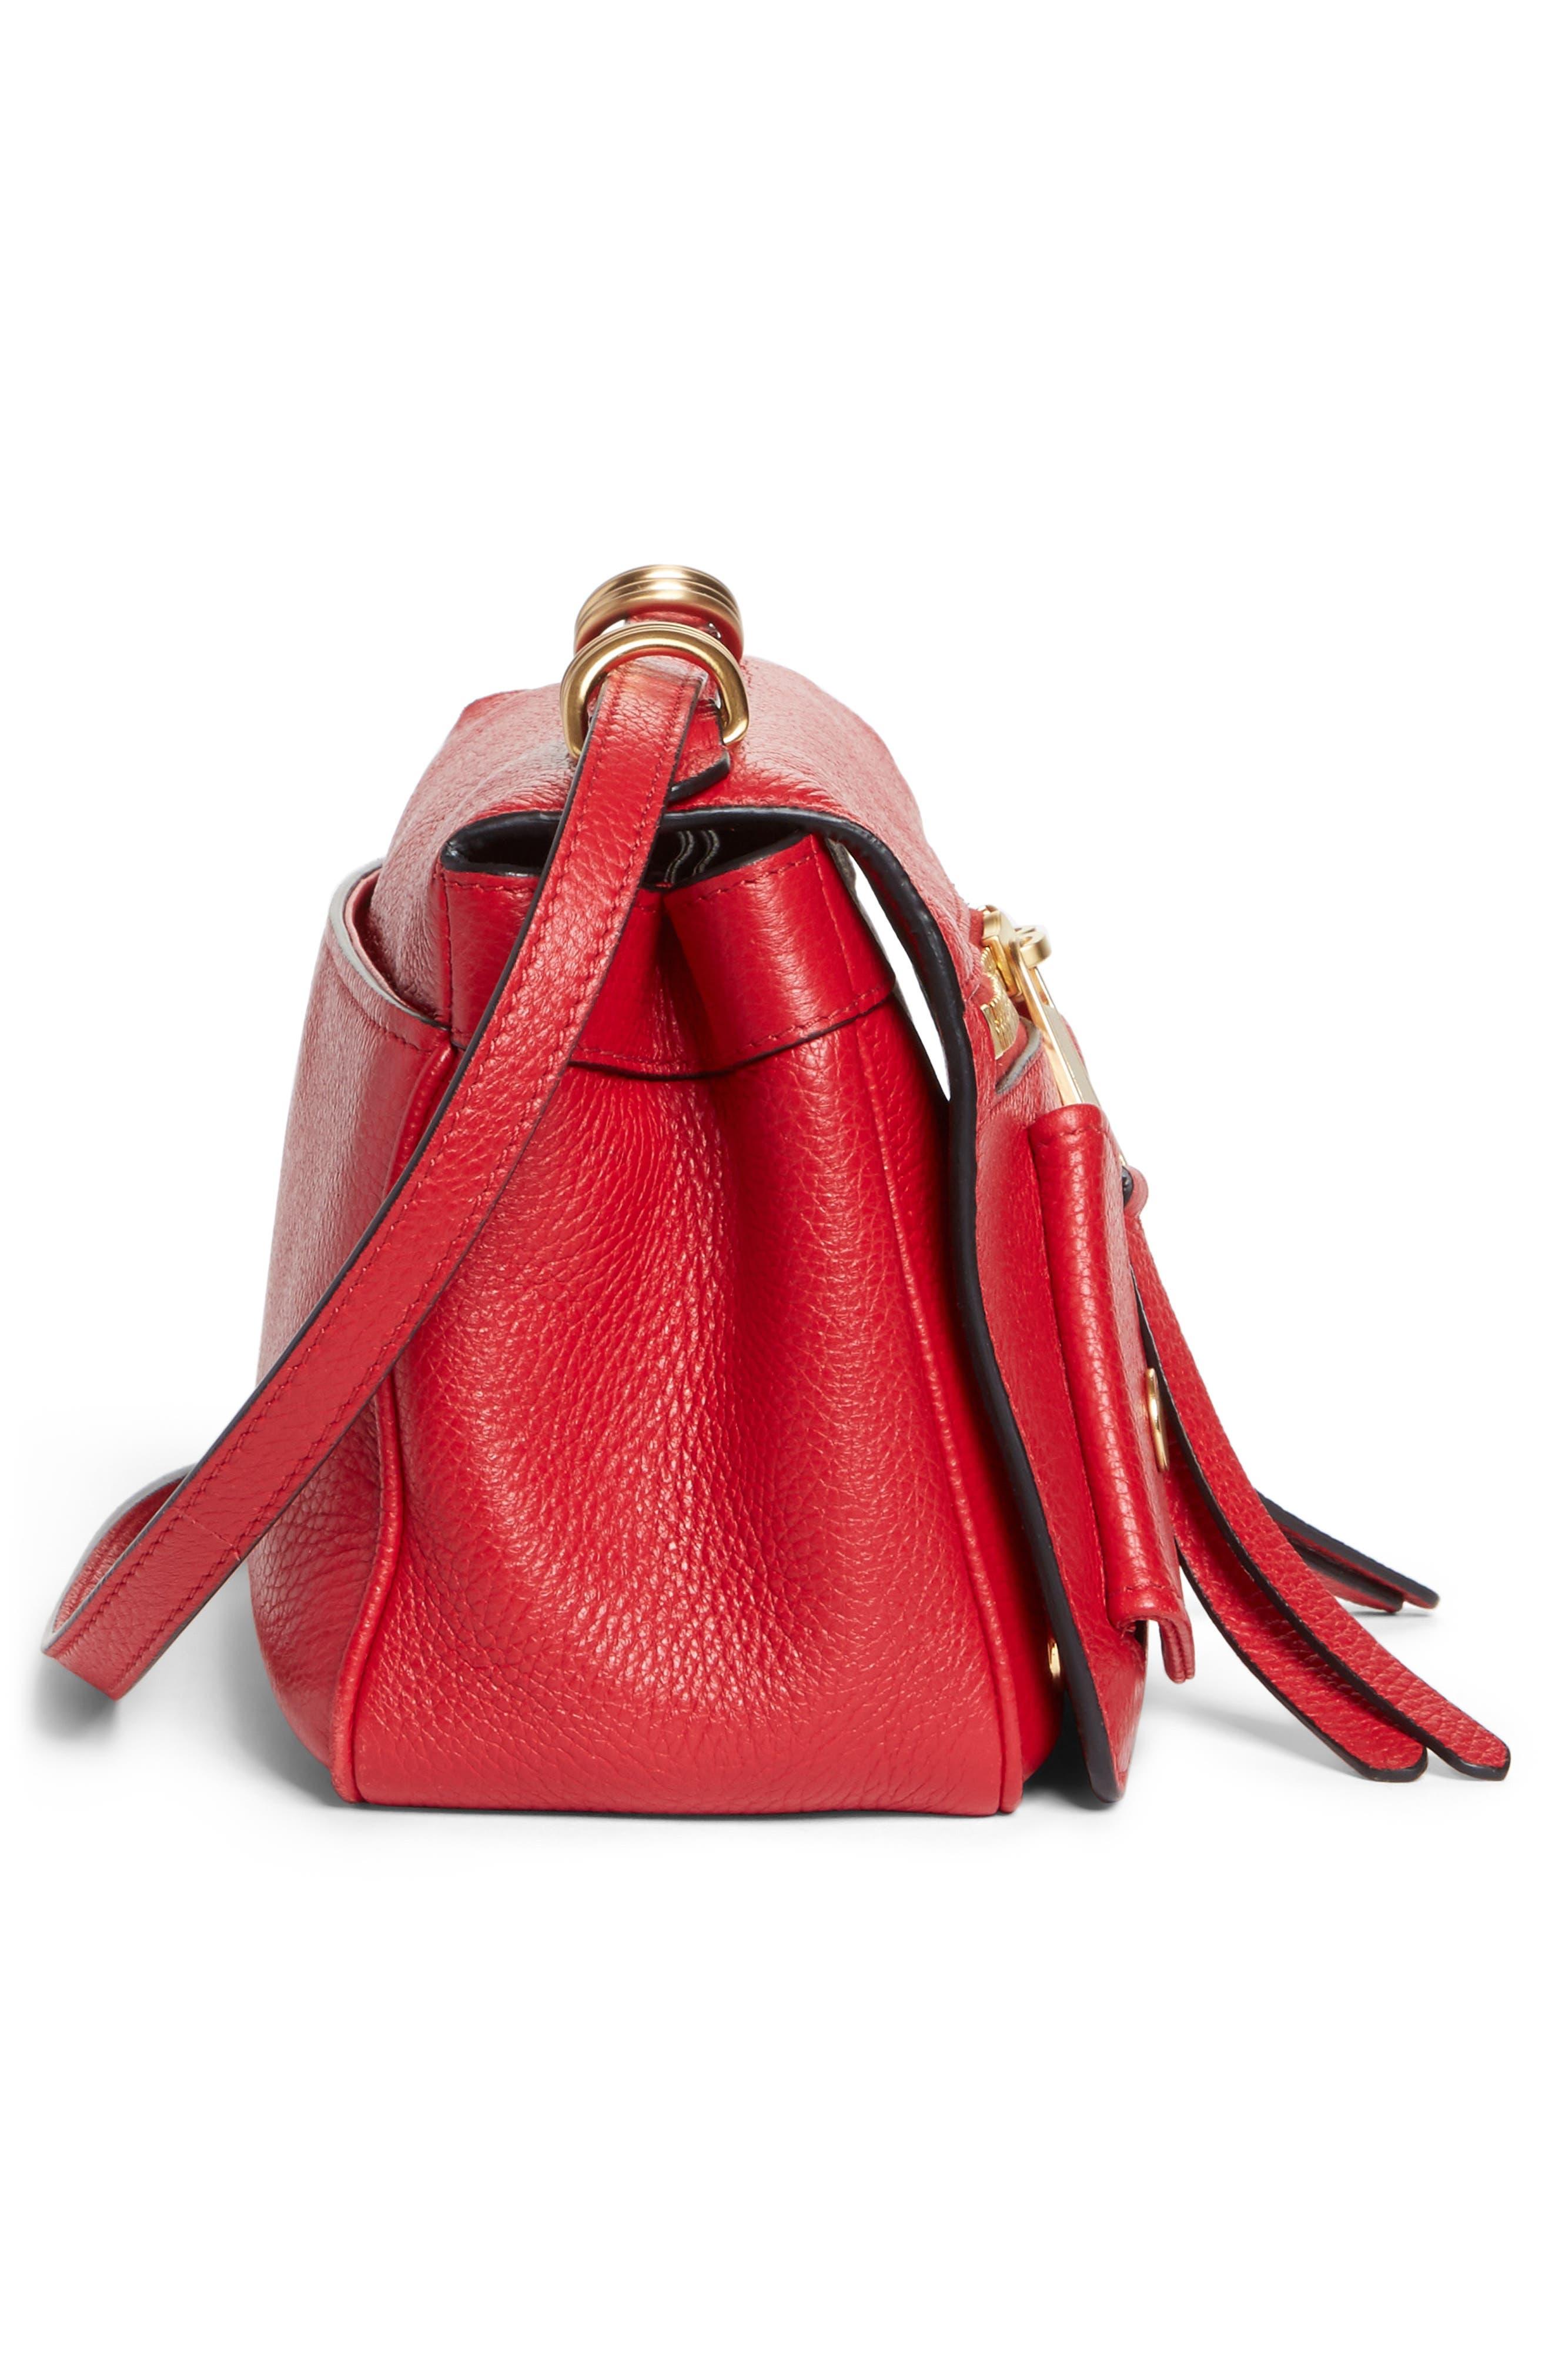 Grainy-B Leather Crossbody Bag,                             Alternate thumbnail 5, color,                             Red